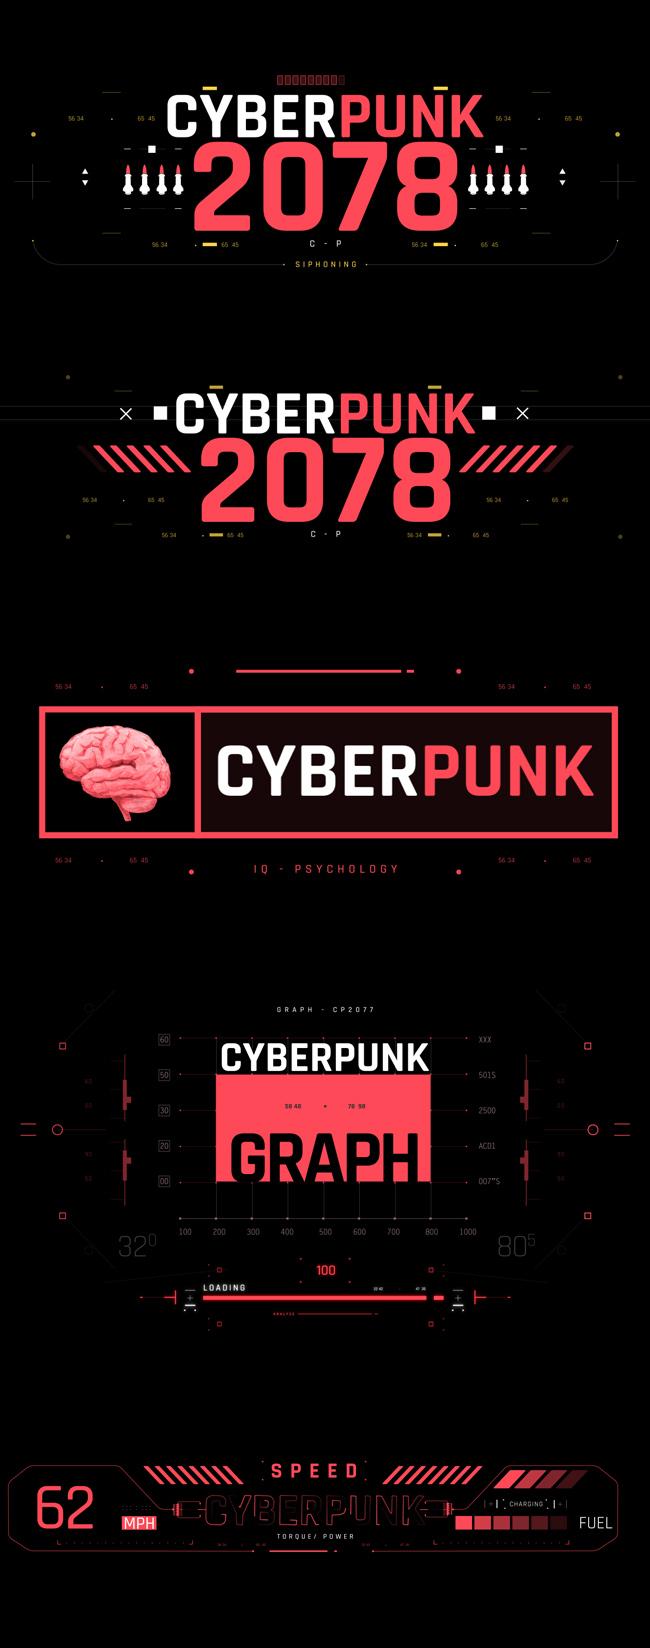 AE脚本-500个HUD高科技赛博朋克UI科幻界面元素动画预设包 Cyberpunk HUD UI 500+ 已修复中文版AE表达式报错插图6